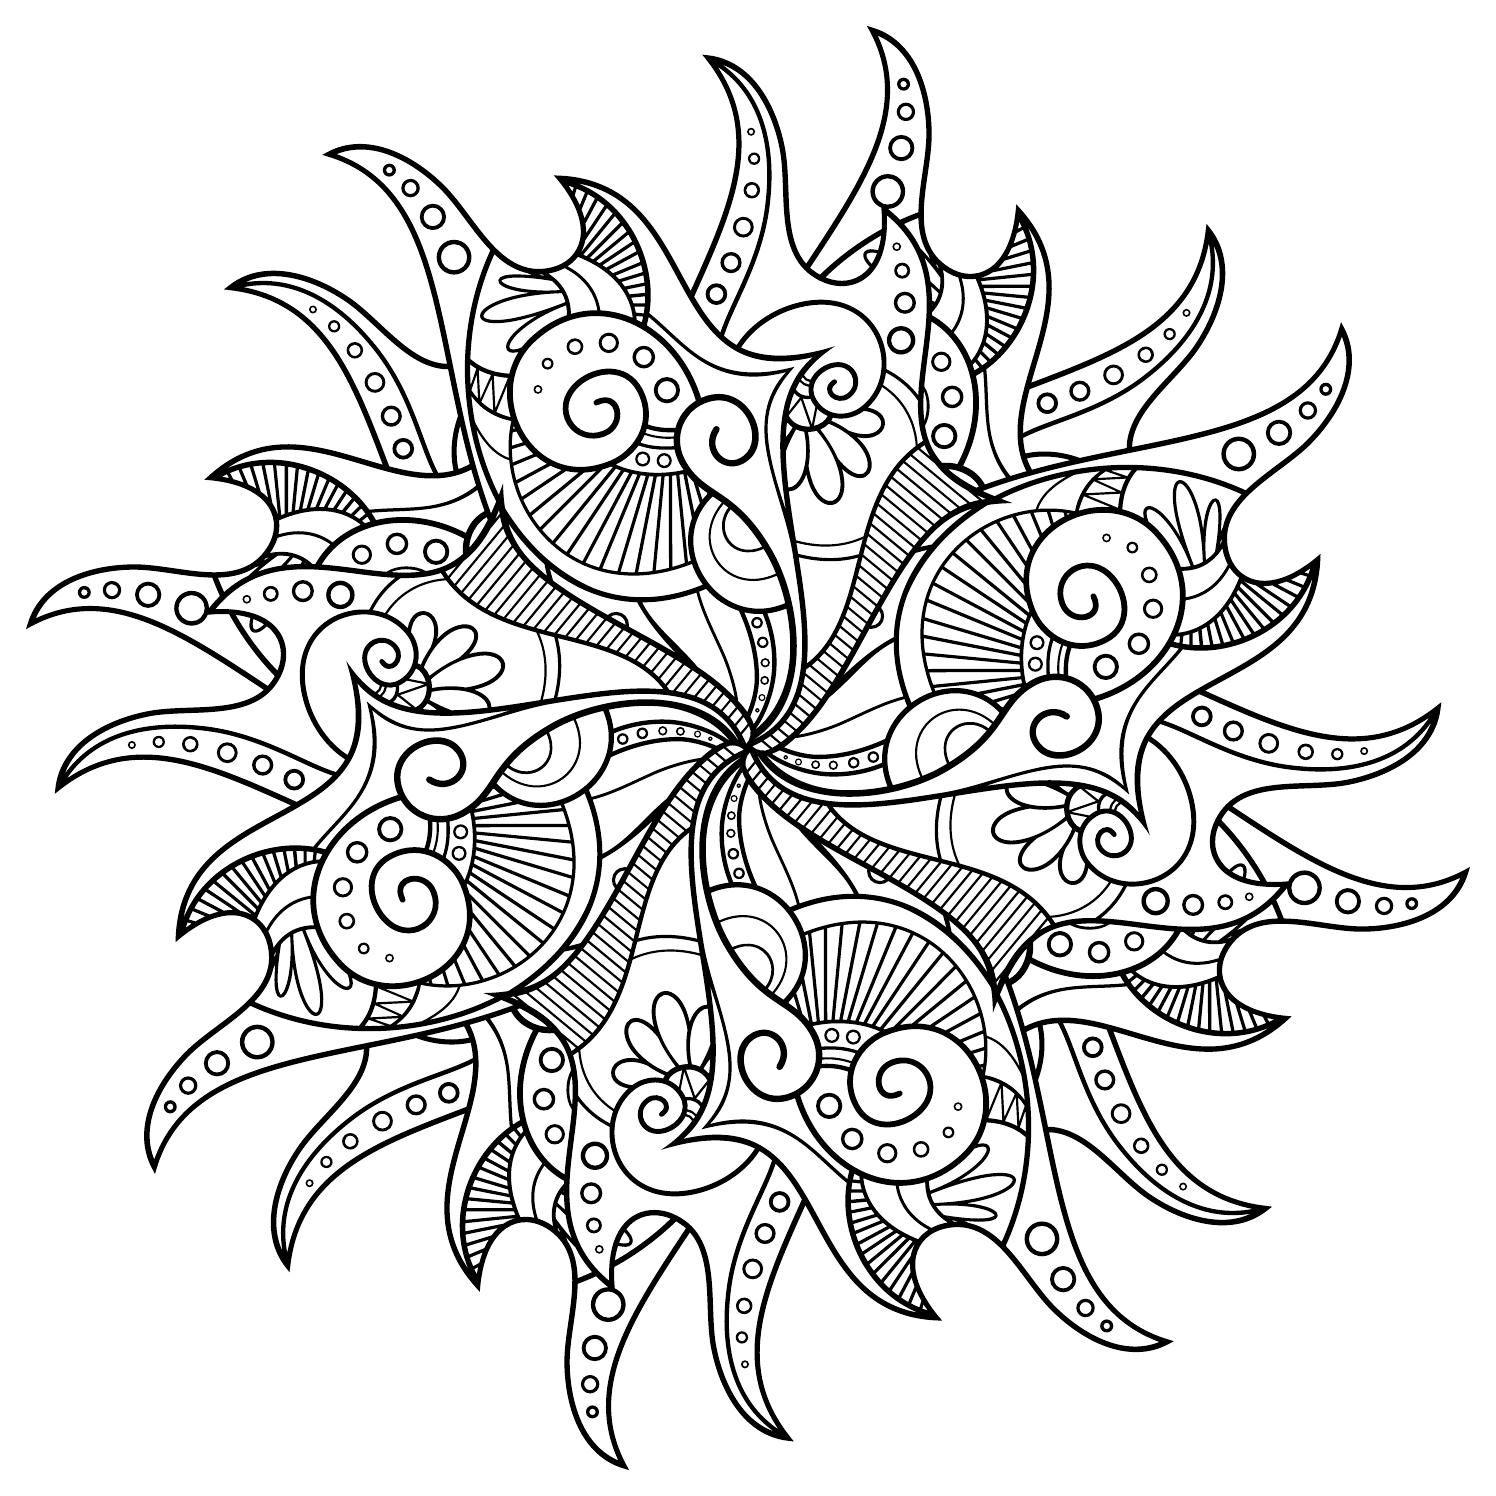 Amzinoji mandala desen pinterest coloriage mandala ve coloriage zen - Mandala adulte ...